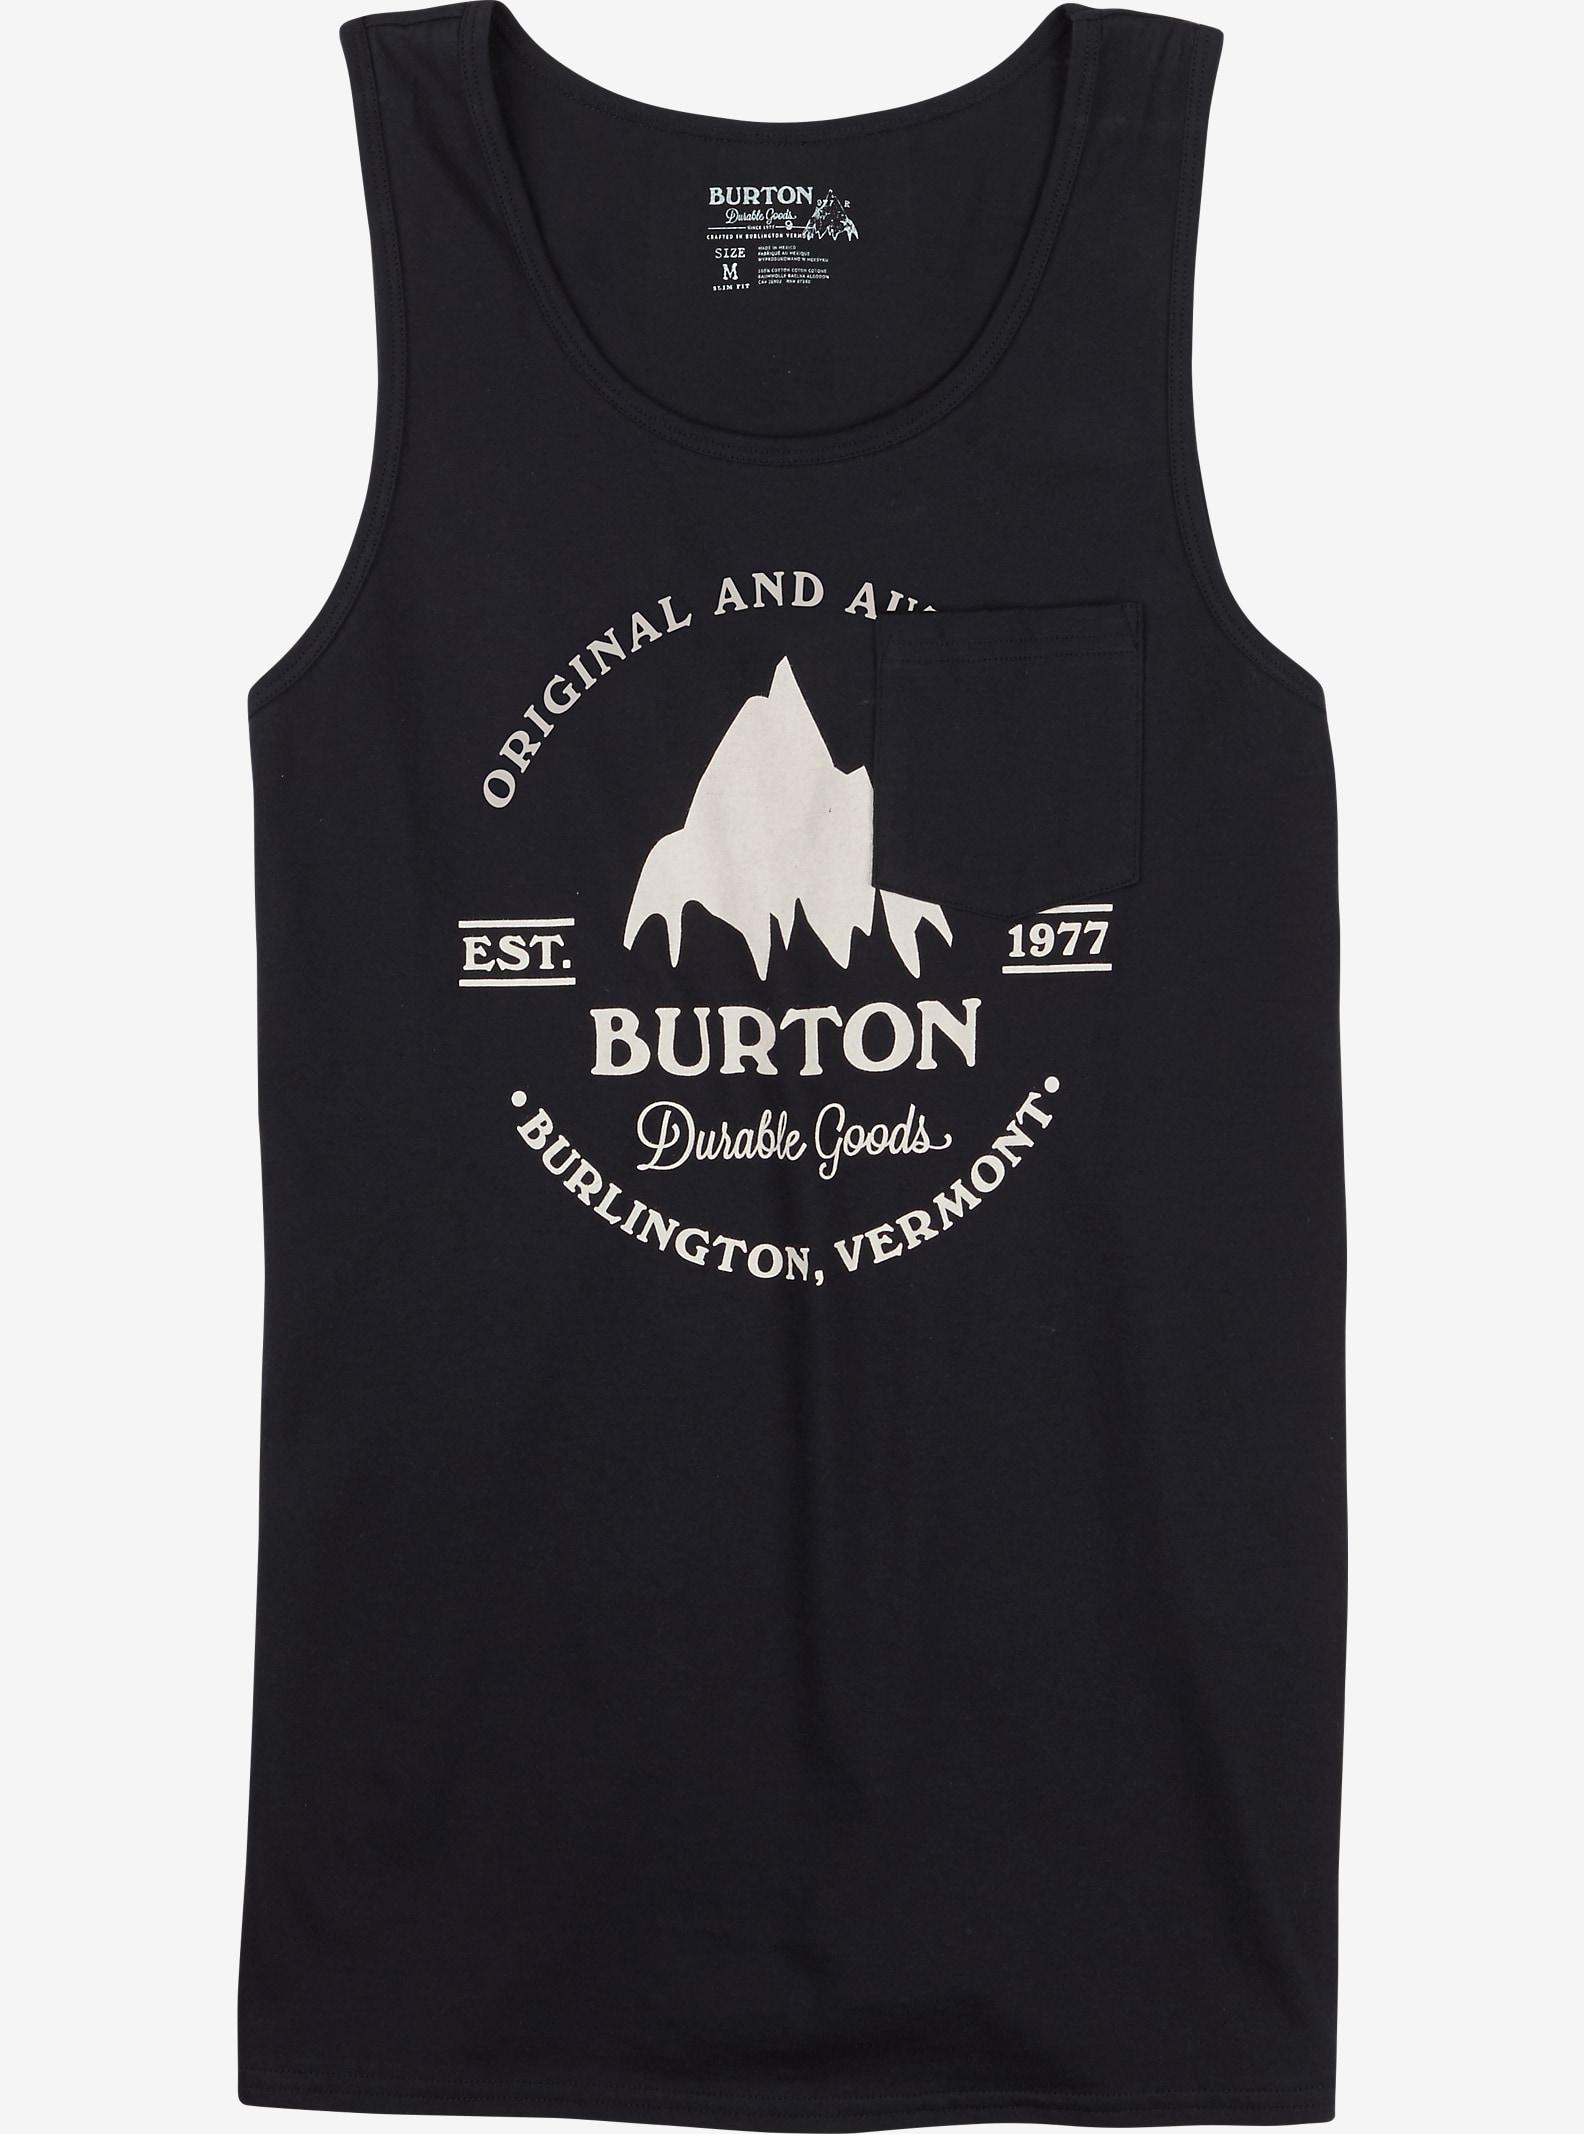 Burton Gristmill Tank shown in True Black